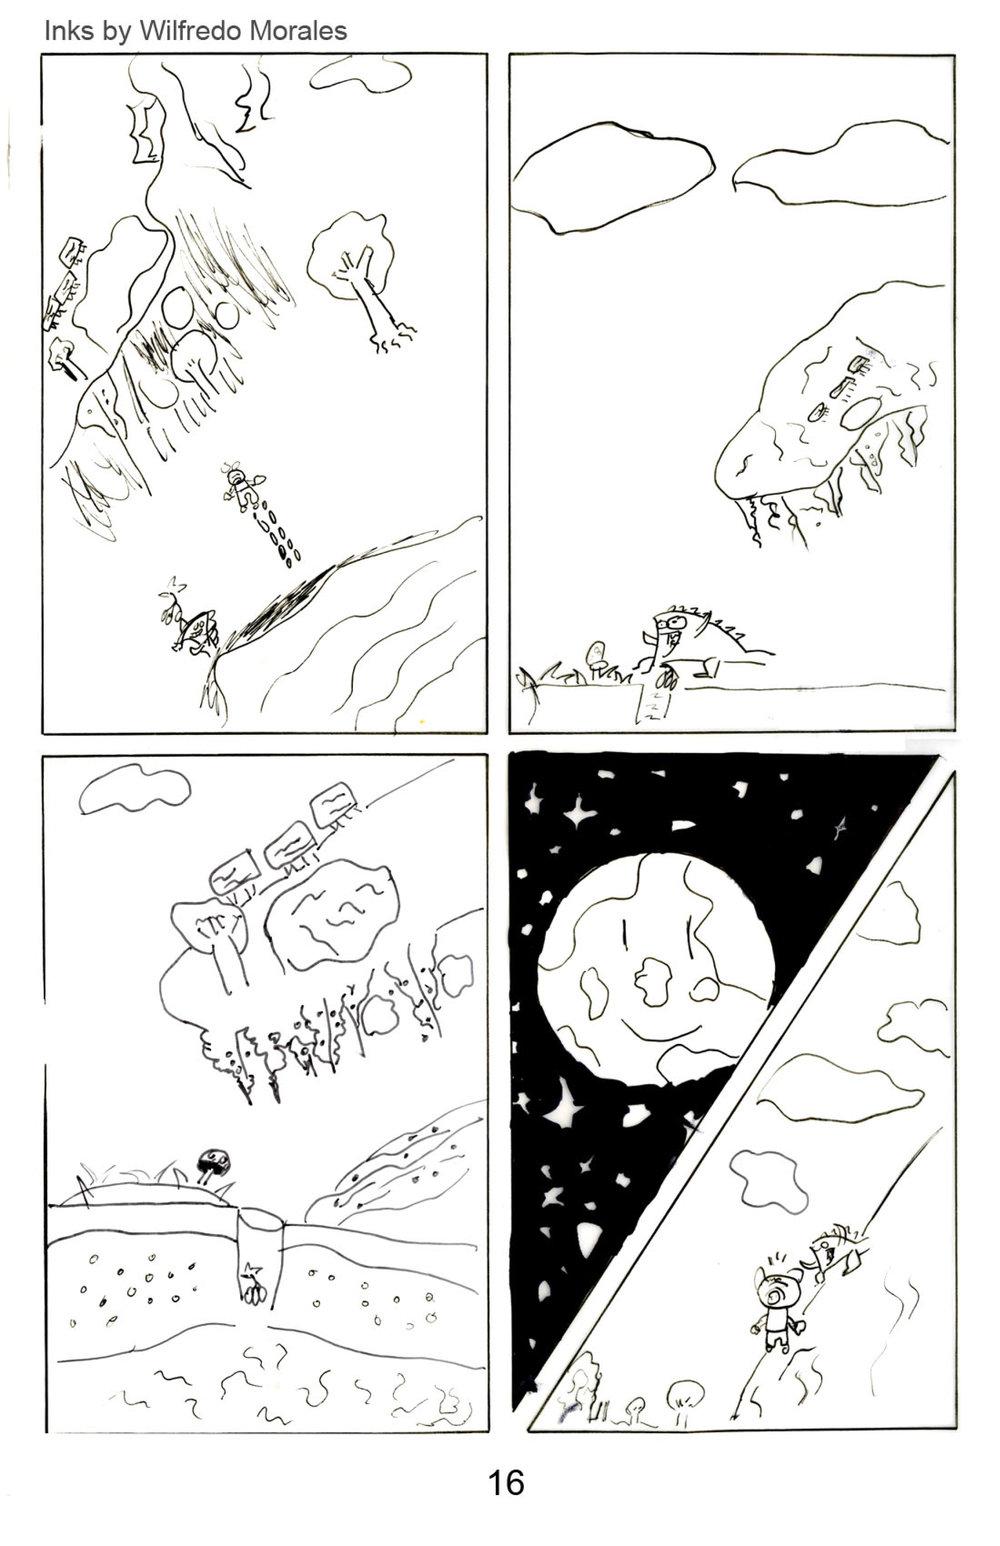 ev page 16.jpg